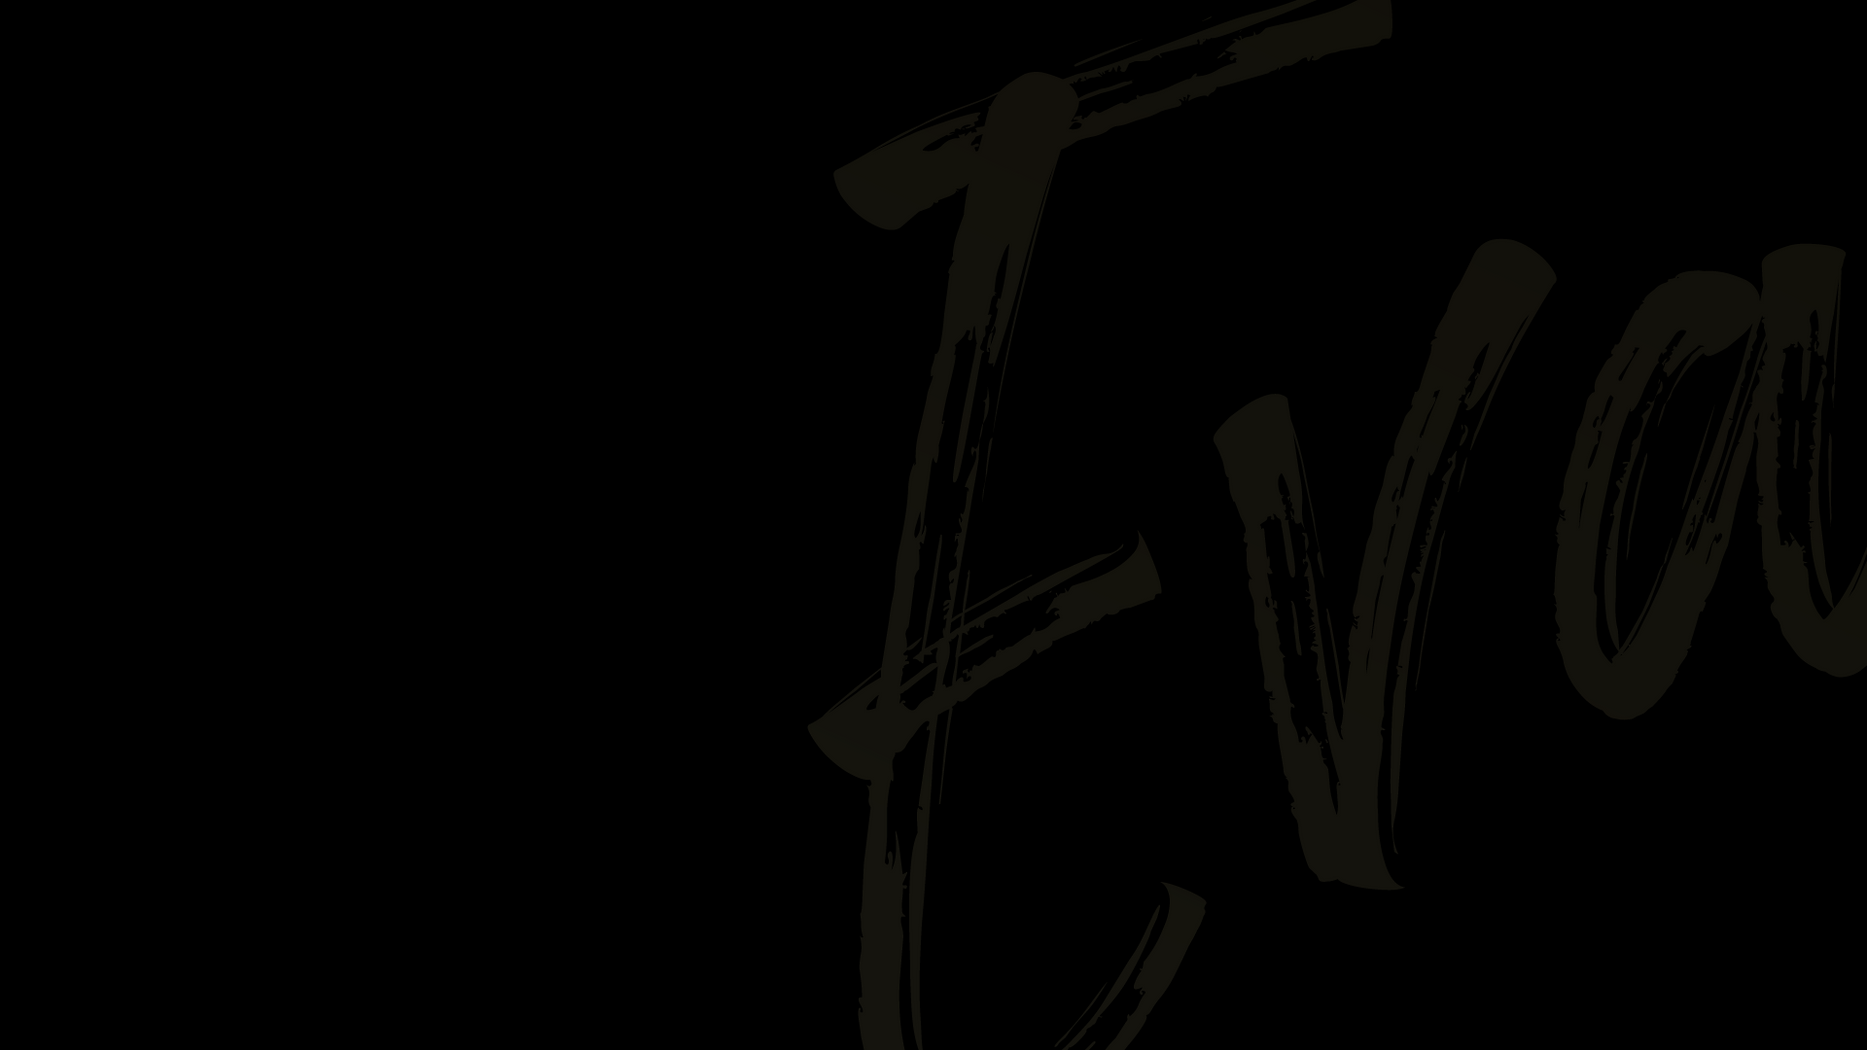 Eva Website Backgrounds 1920 x 1080 H DI